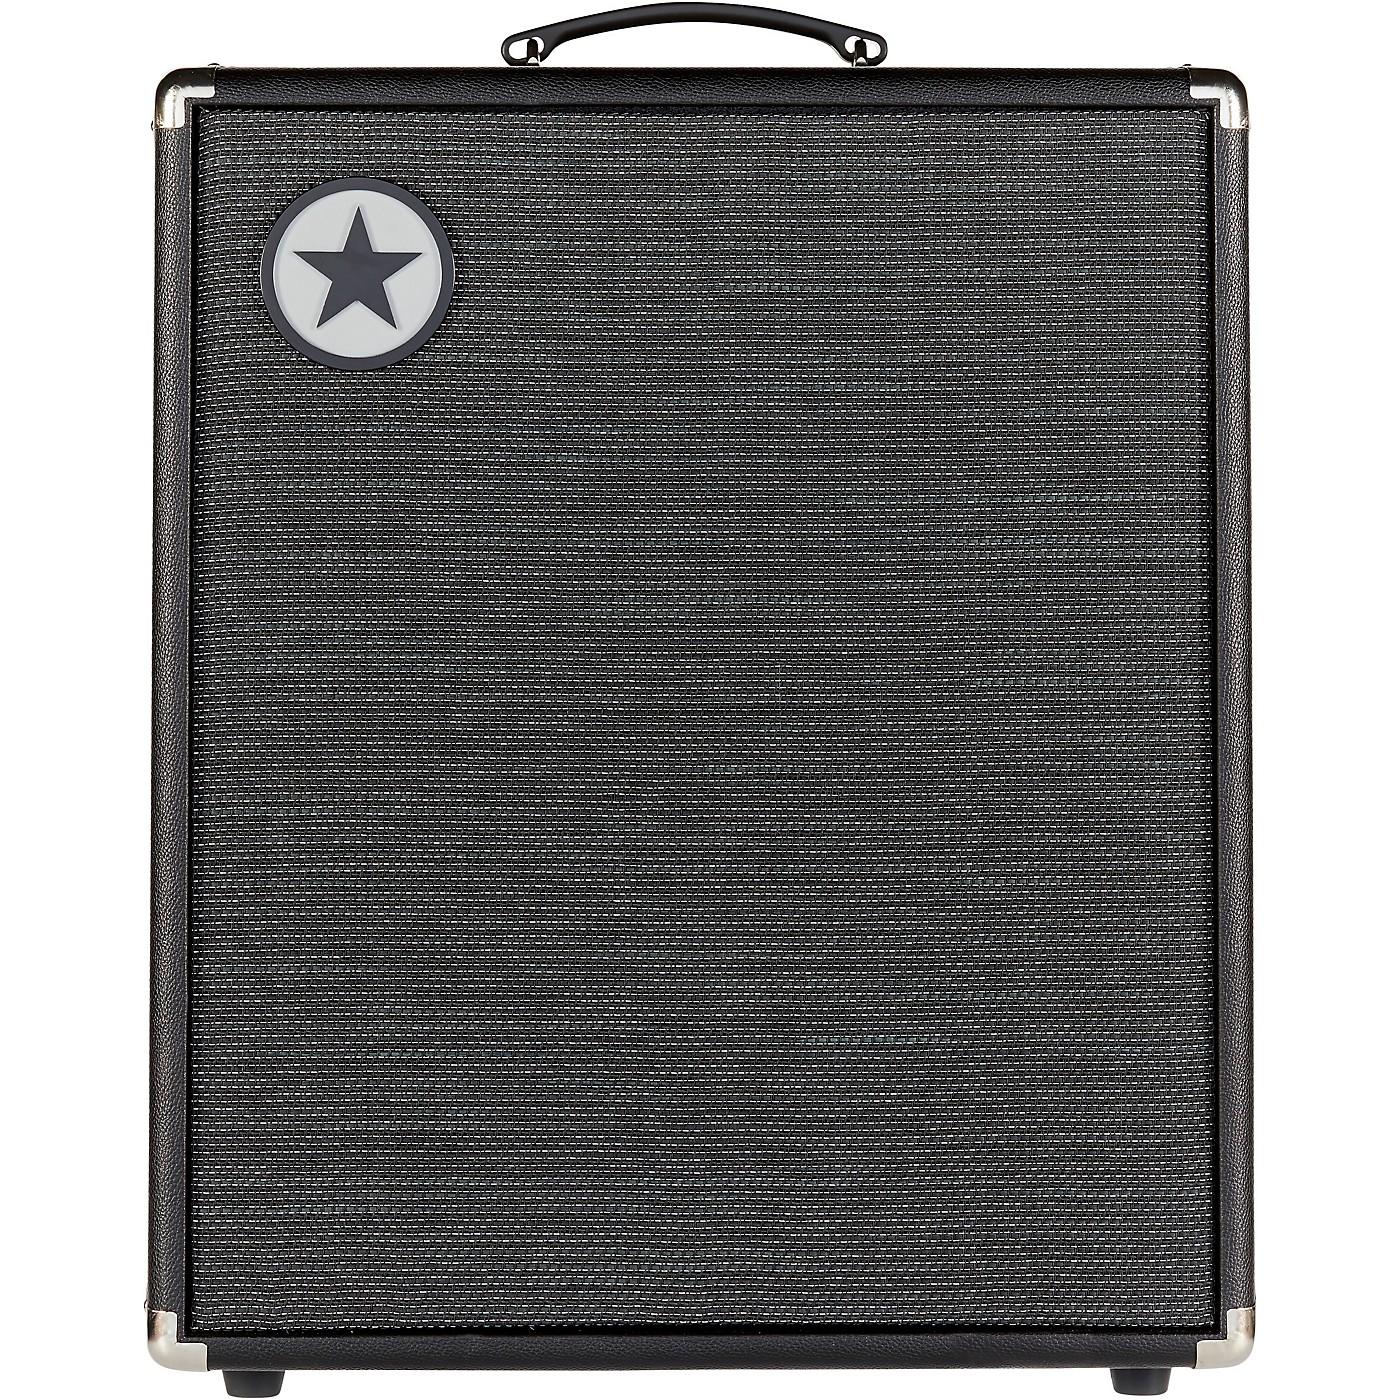 Blackstar Unity BASSU500 500W 2x10 Bass Combo Amplifier thumbnail